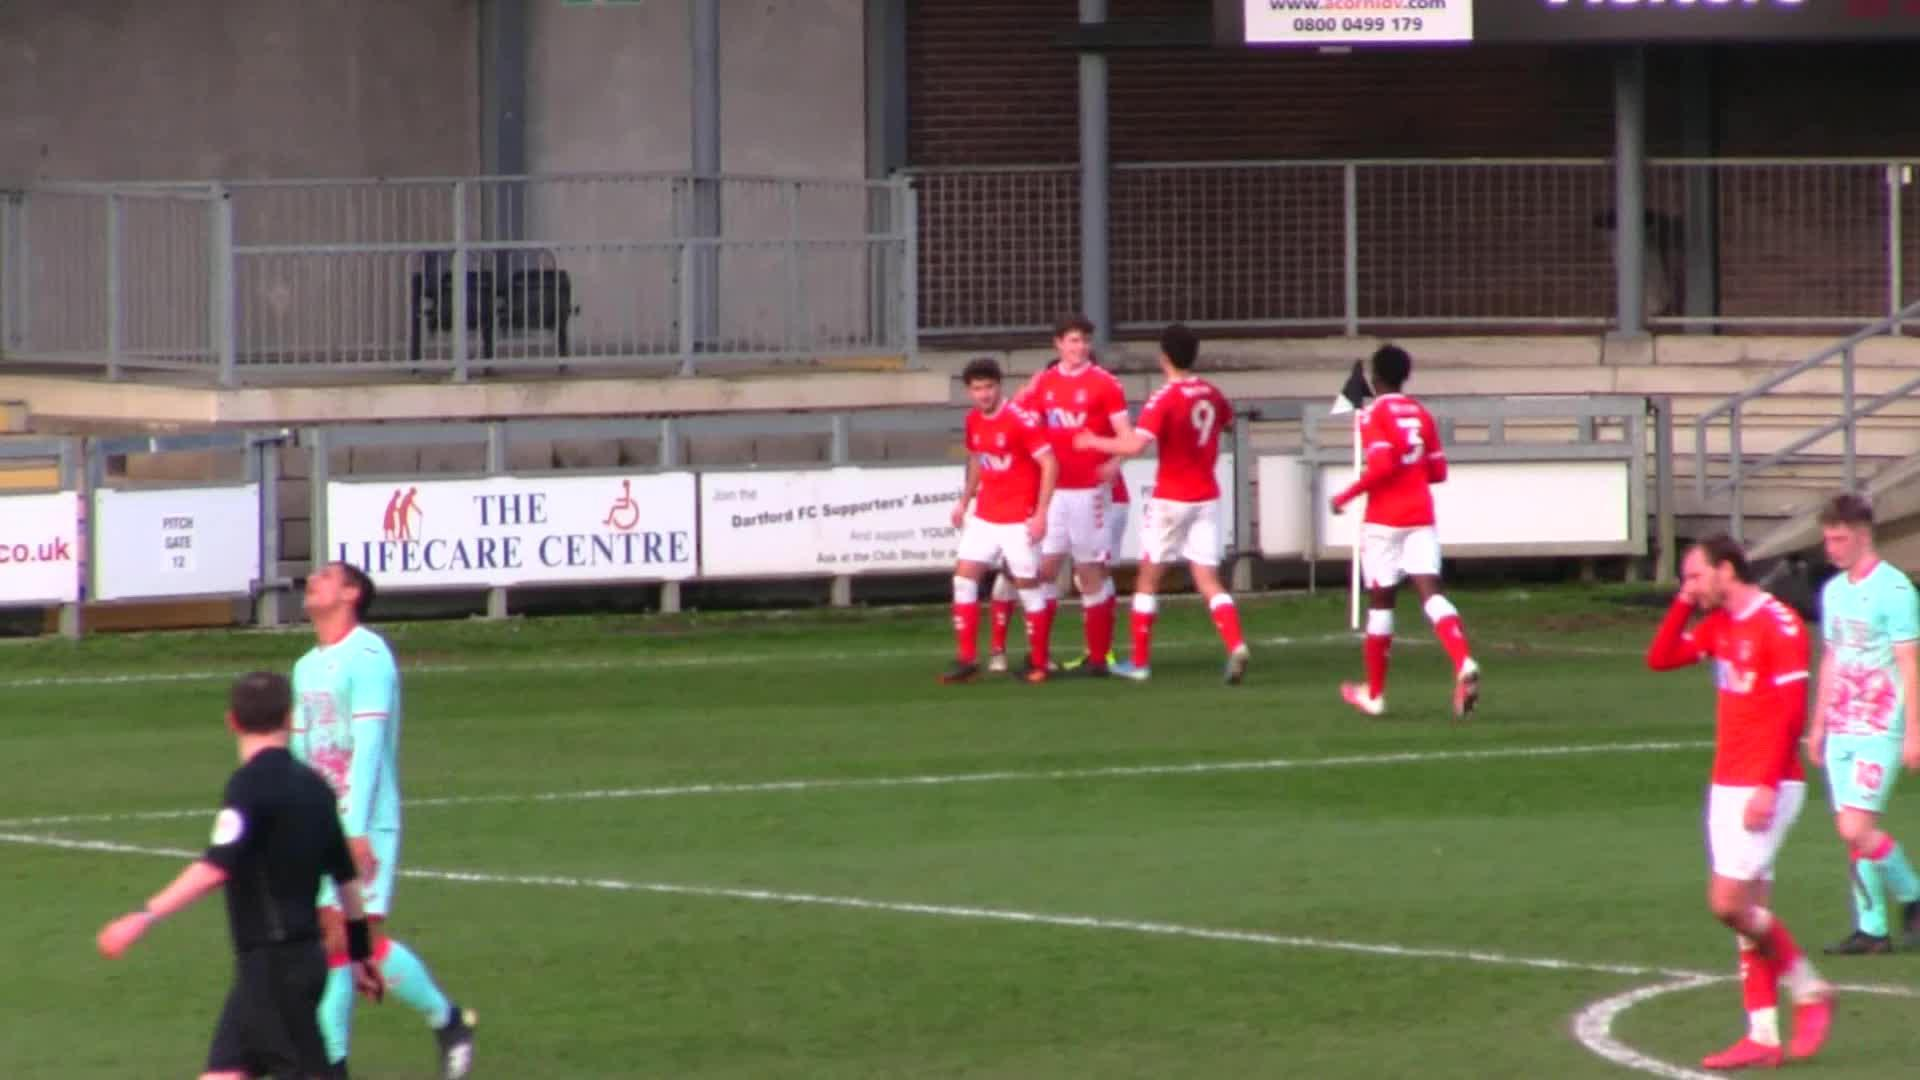 U23 Highlights | Charlton 3 Swansea City 4 (February 2021)